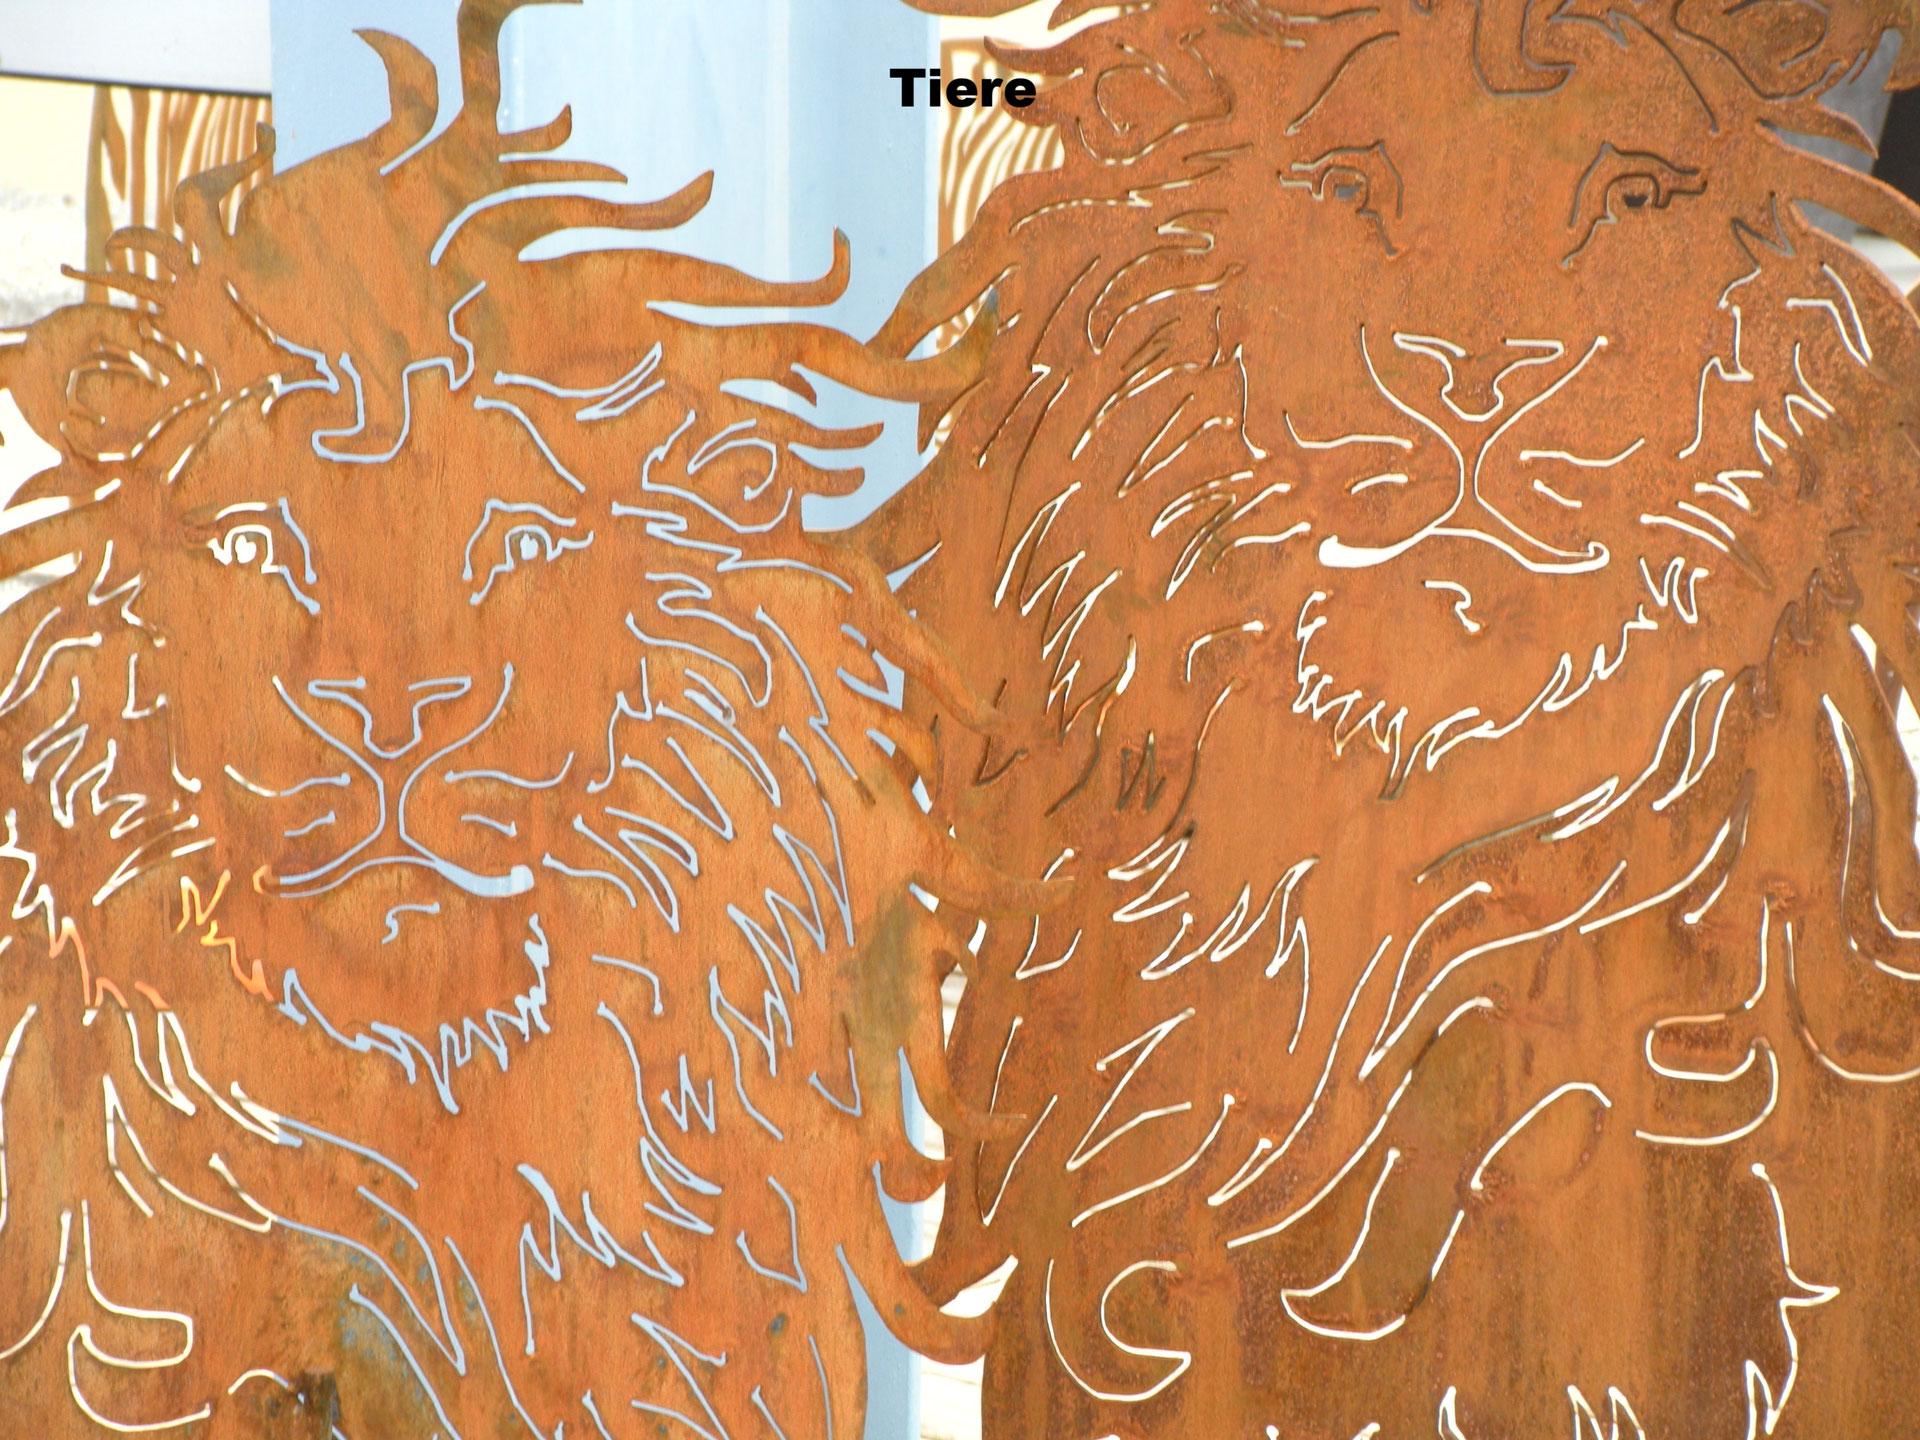 Edel rost helenahutters webseite for Metallkugeln garten rost